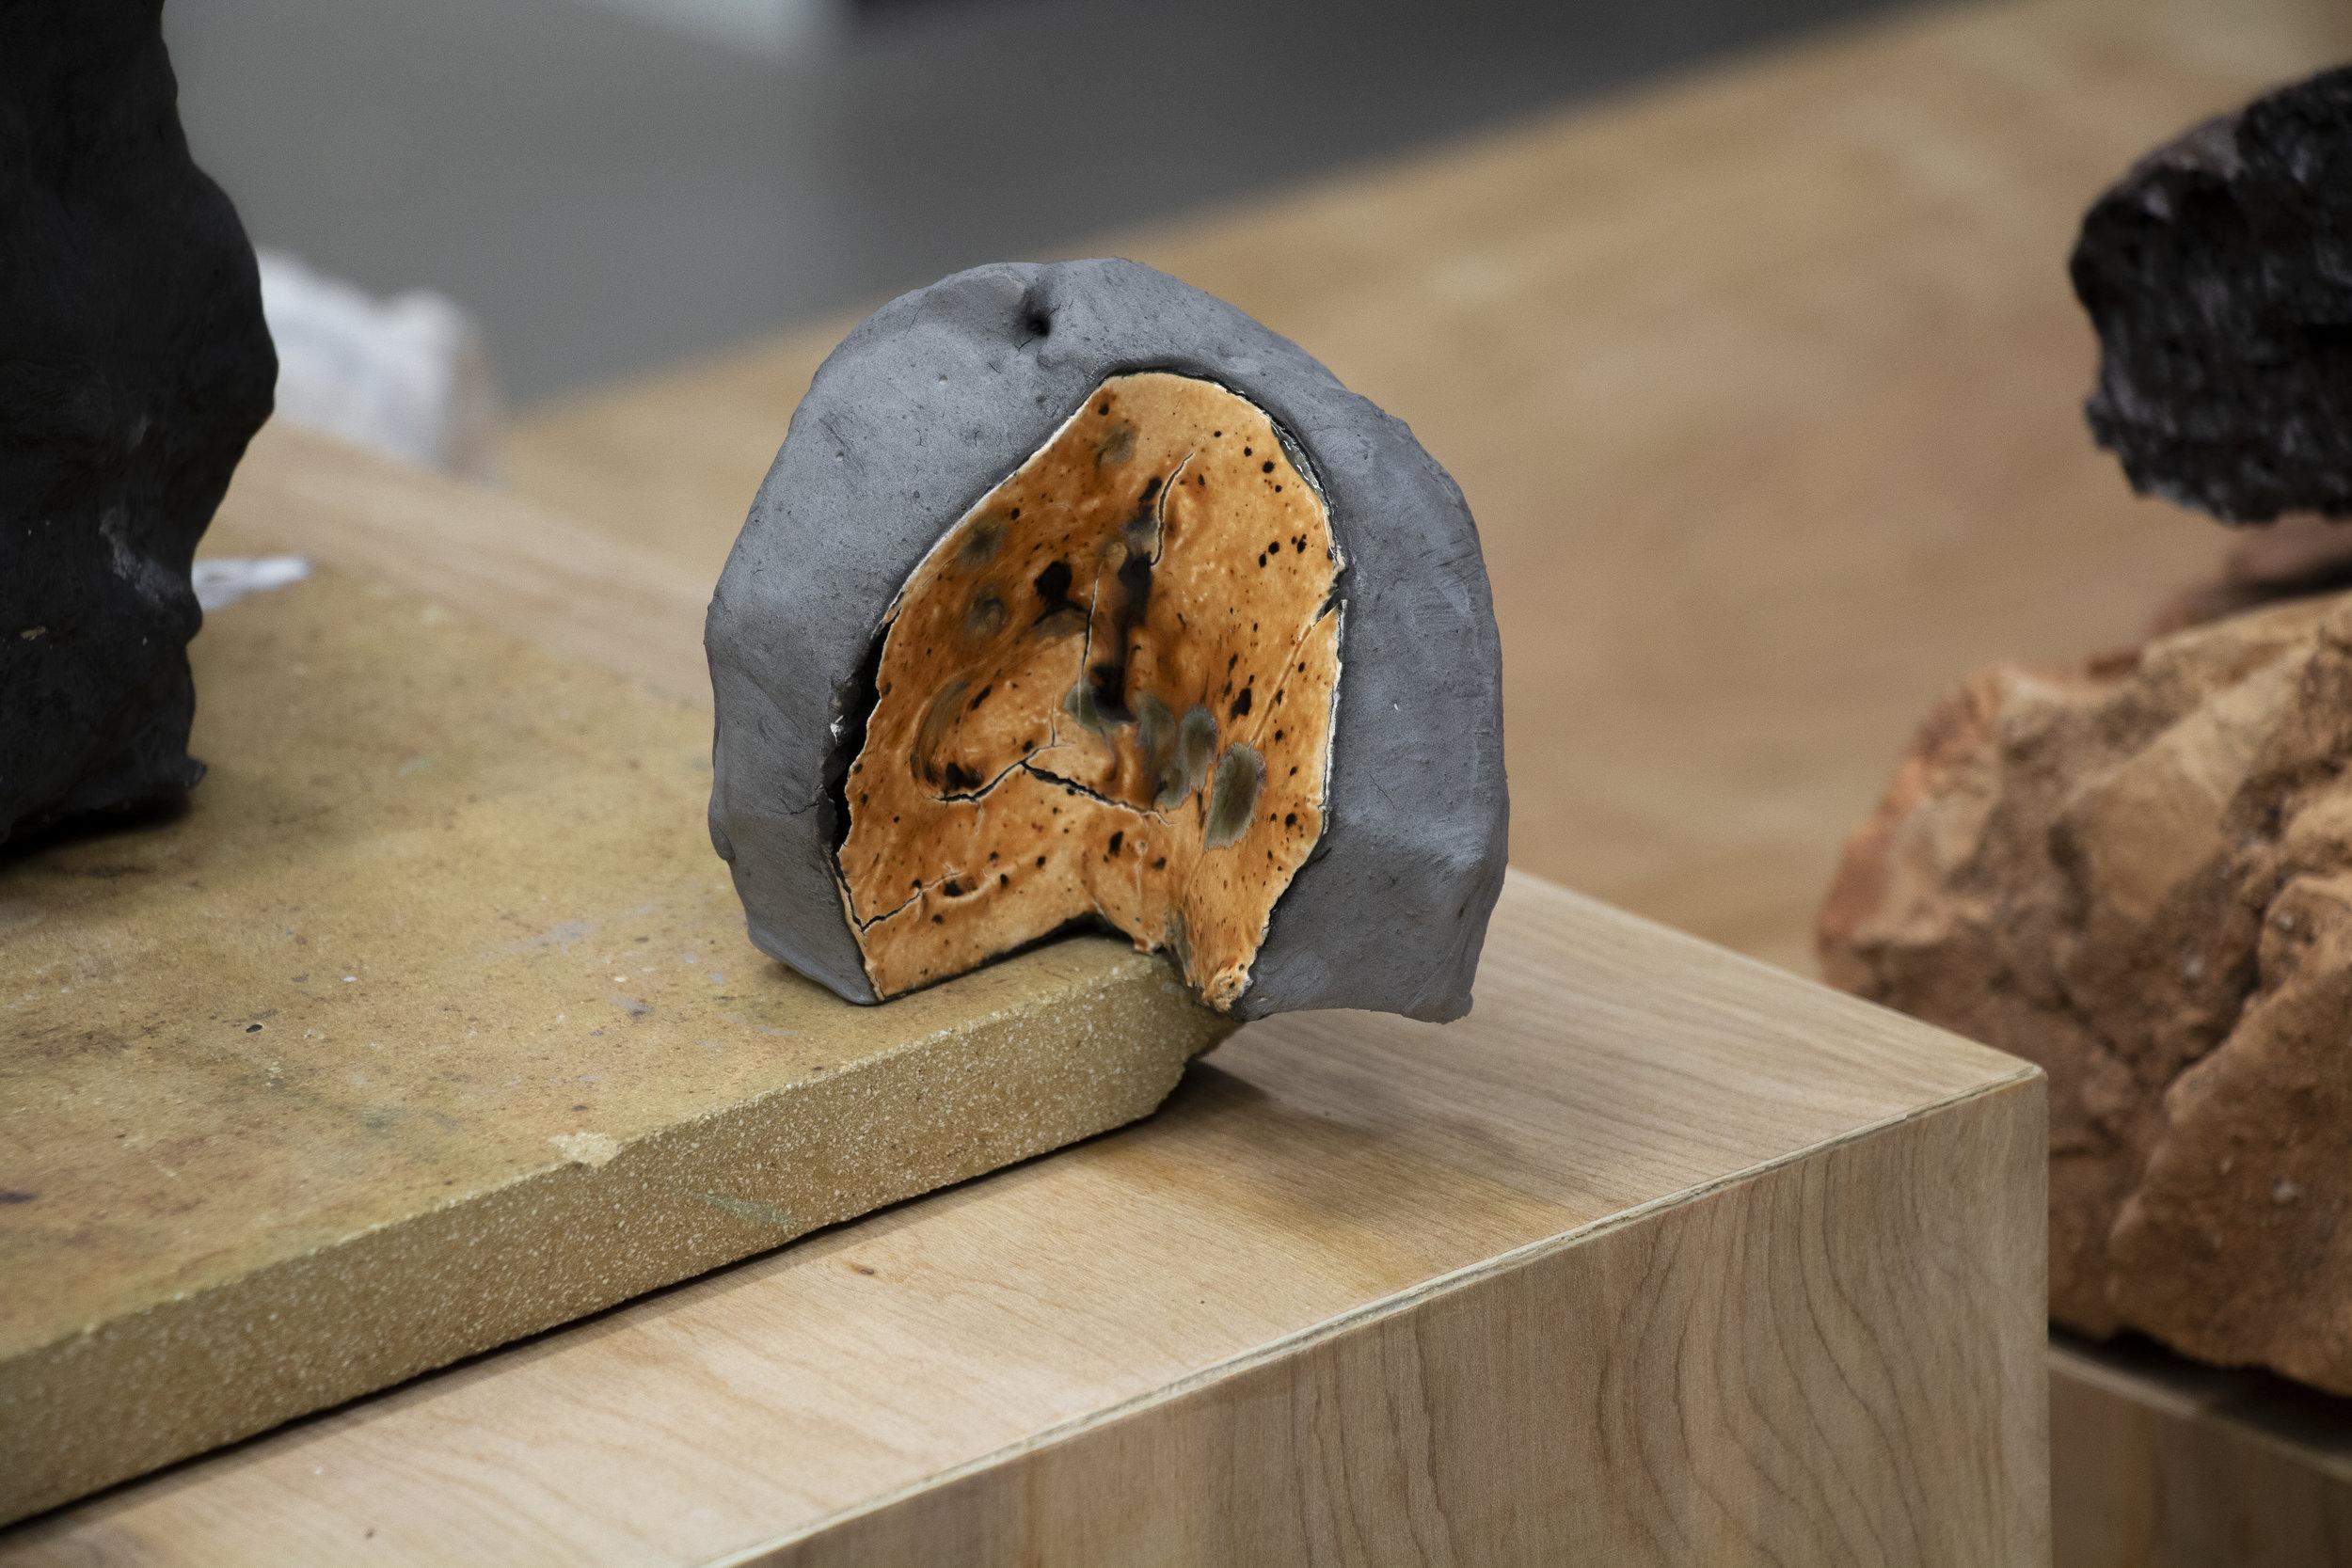 Brit Dyrnes, En tilstand, 2016. Detalj. Keramiske objekter, ulike typer leire. Foto: Aage A. Mikalsen / Kunsthall Trondheim